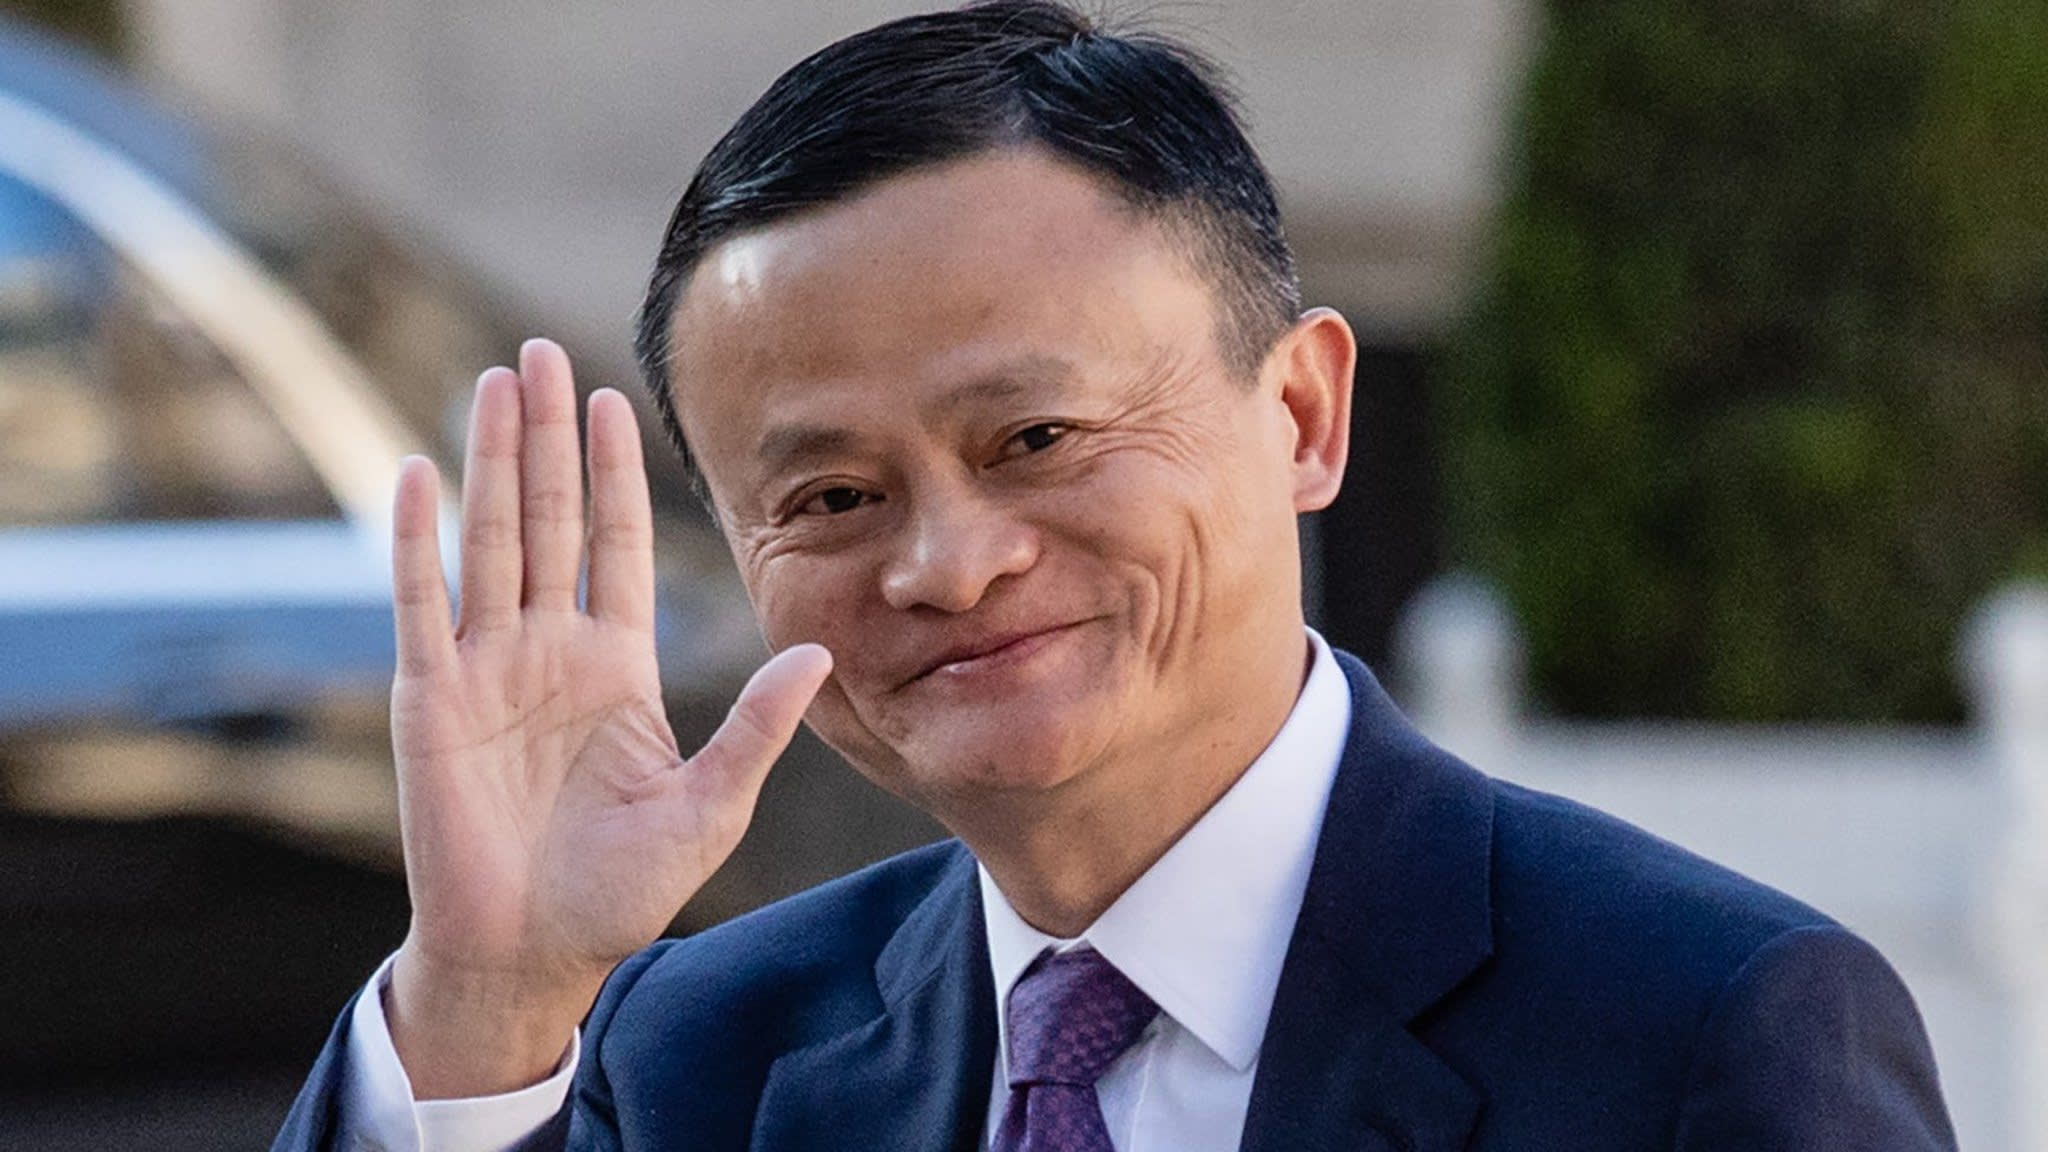 Jack Ma(Alibaba CEO) In My School